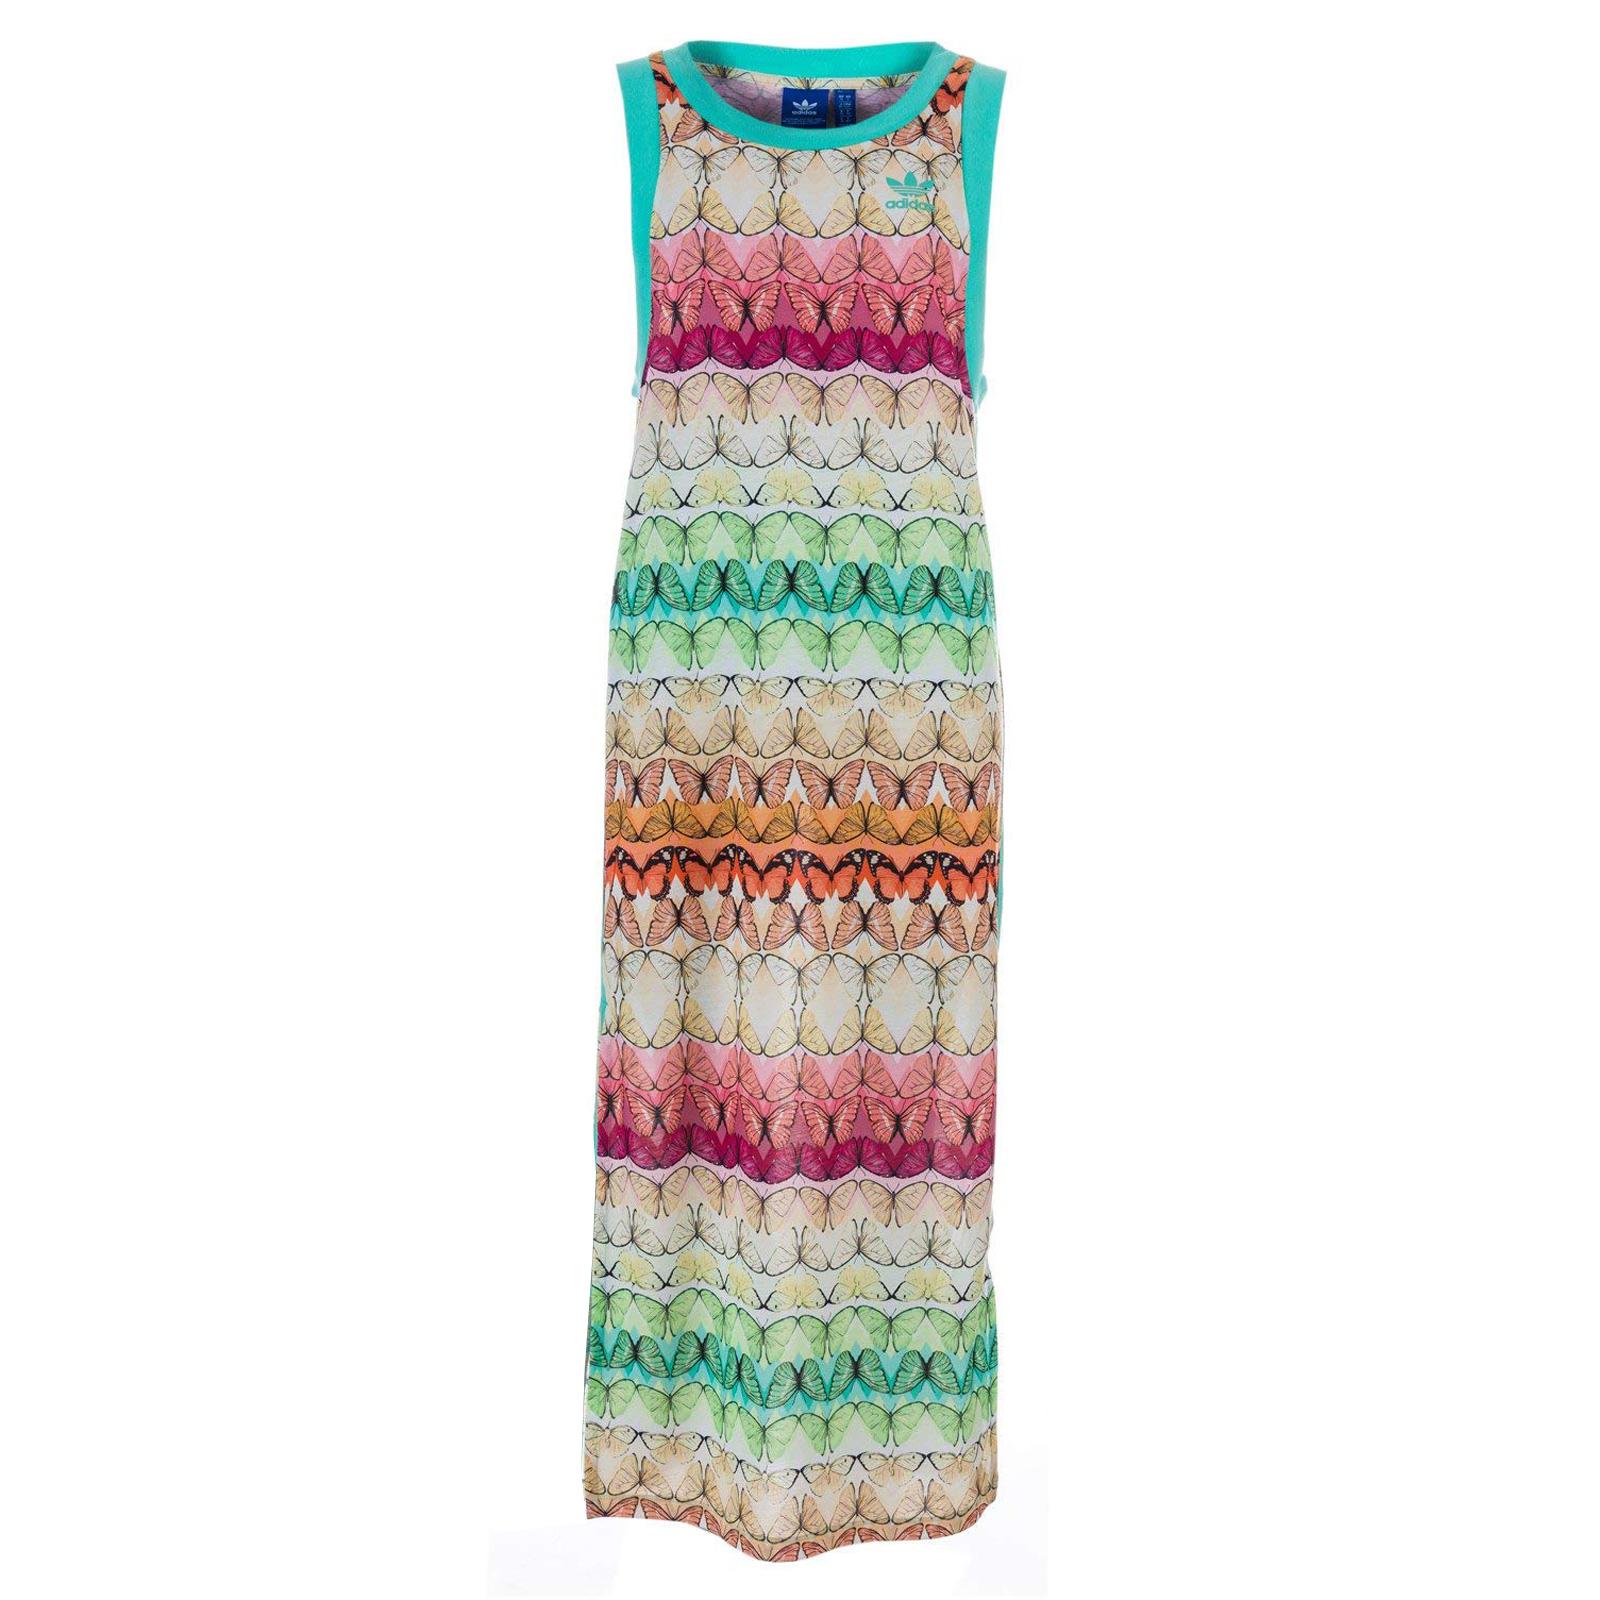 adidas Originals X The Farm Borbofresh Tank Dress Maxikleid Kleid Schmetterling